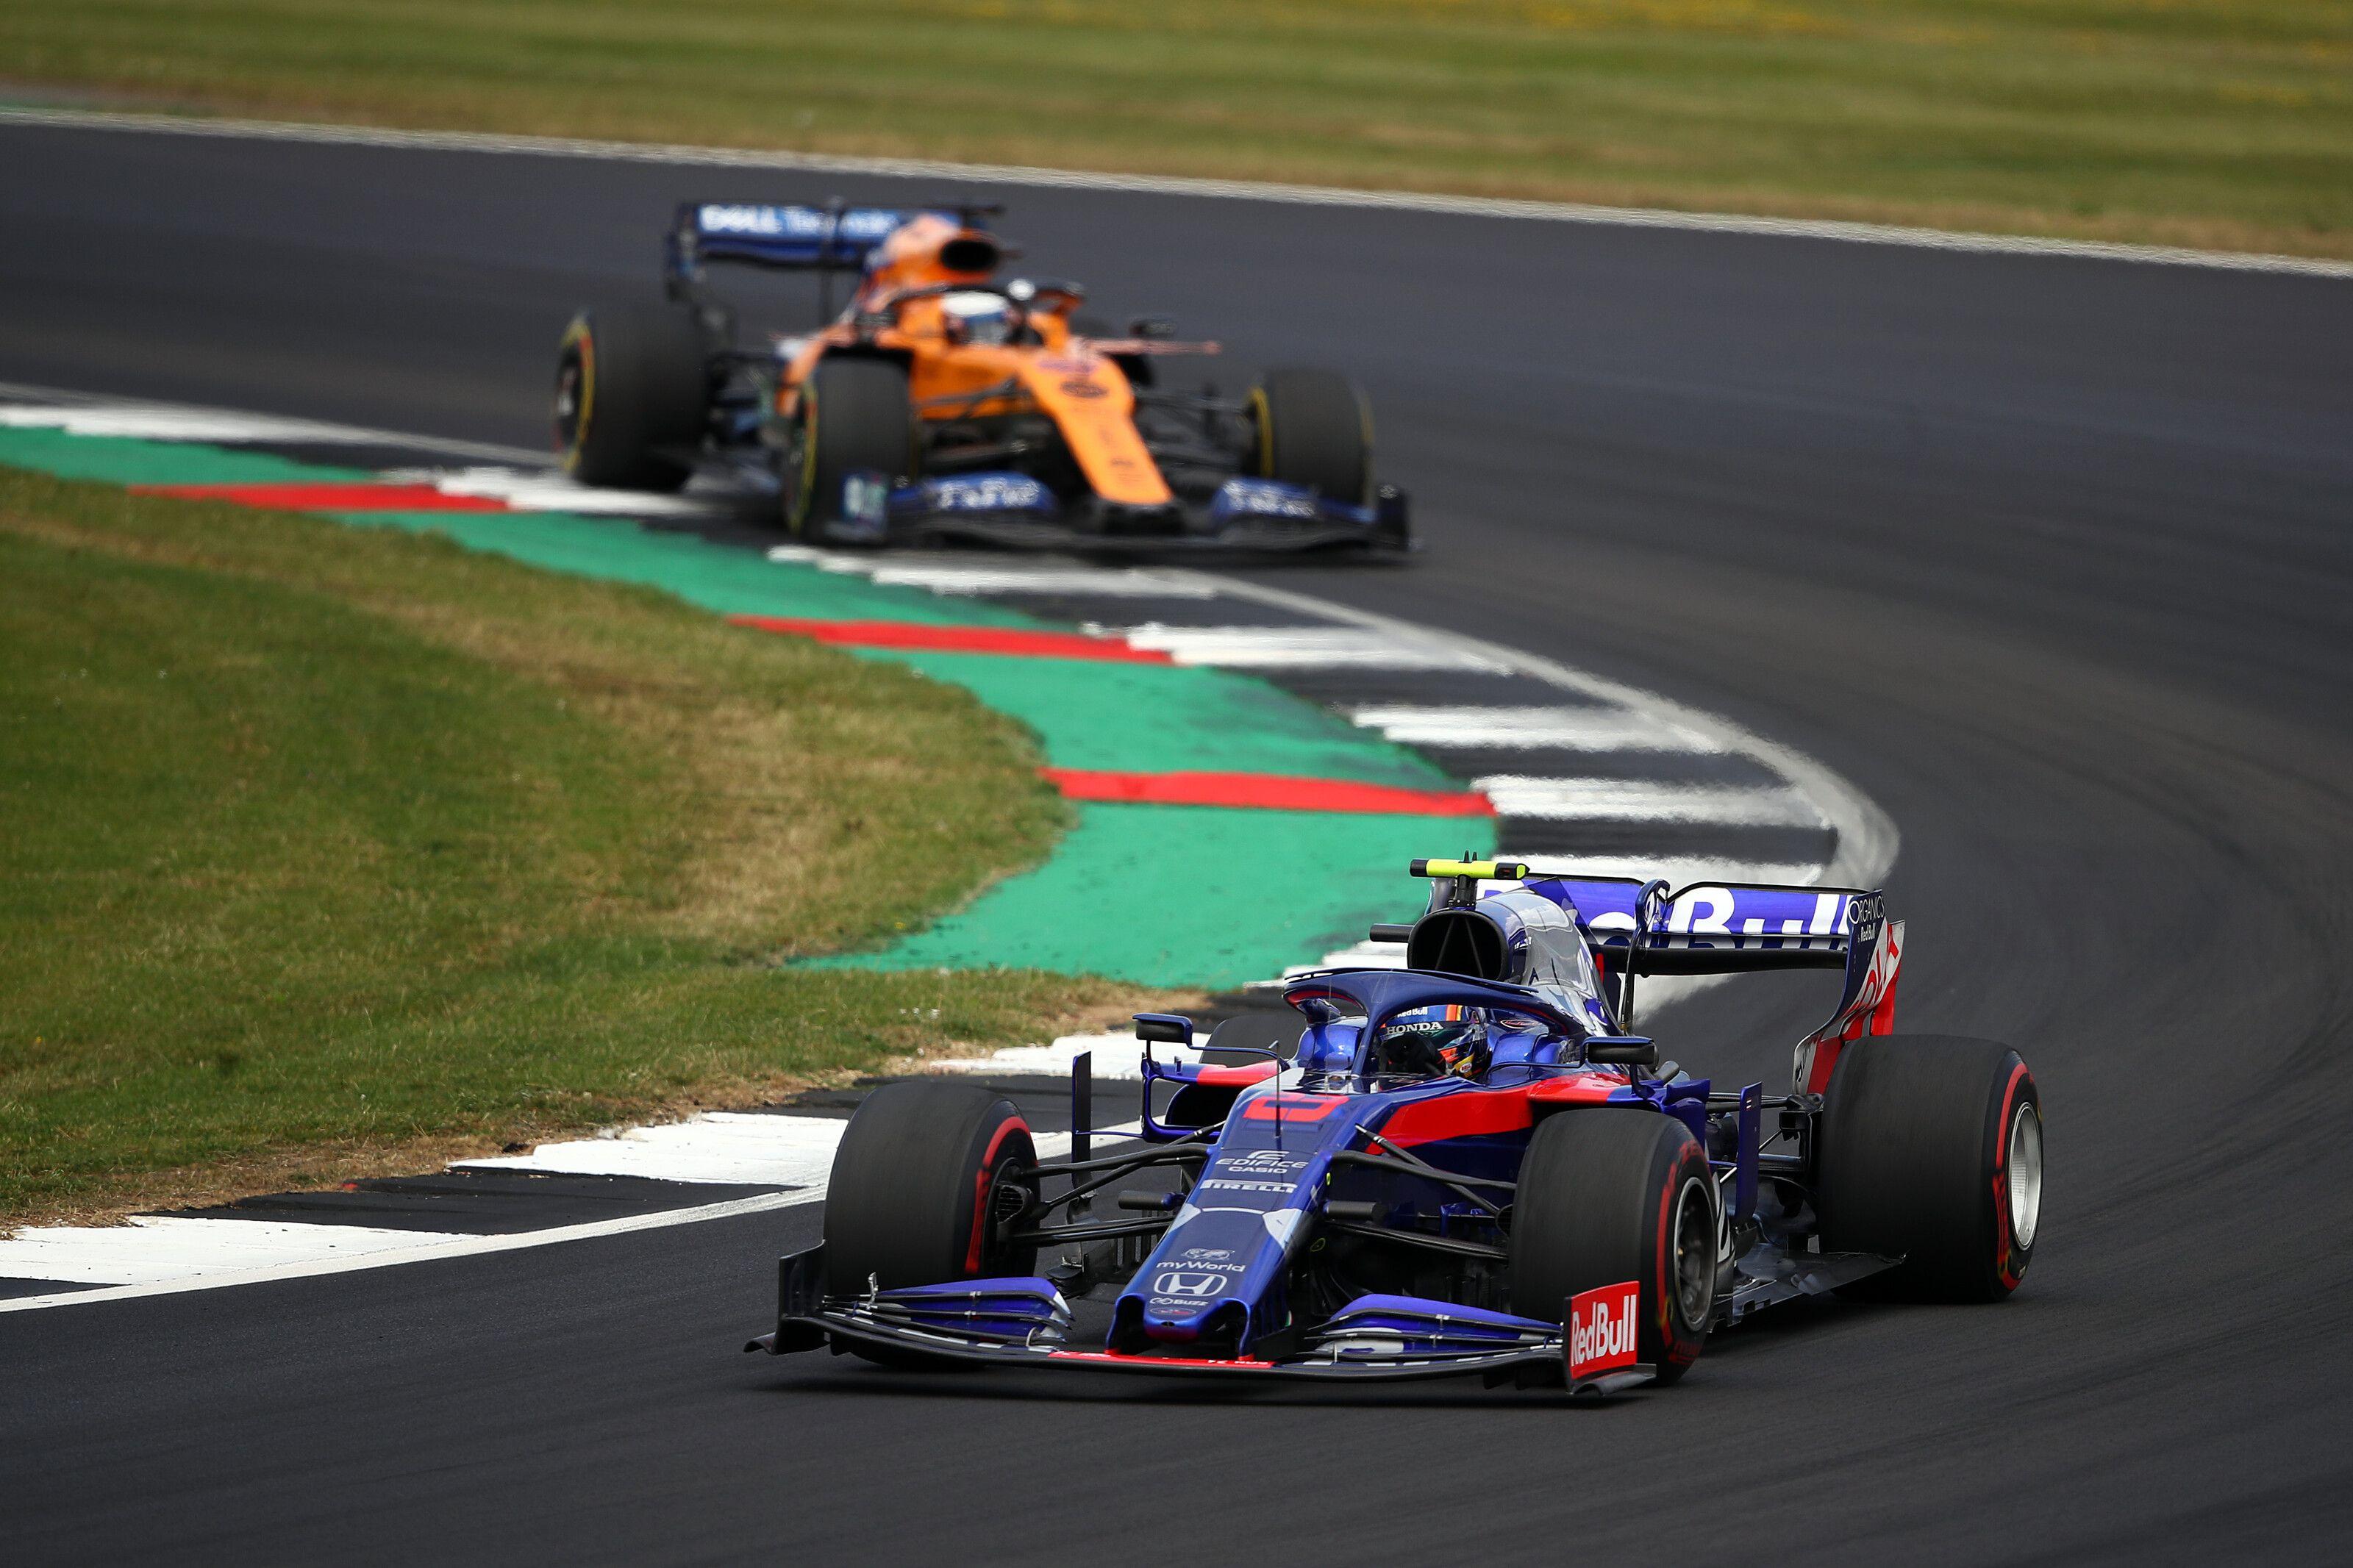 Alexander Albon, Toro Rosso, Honda, British GP